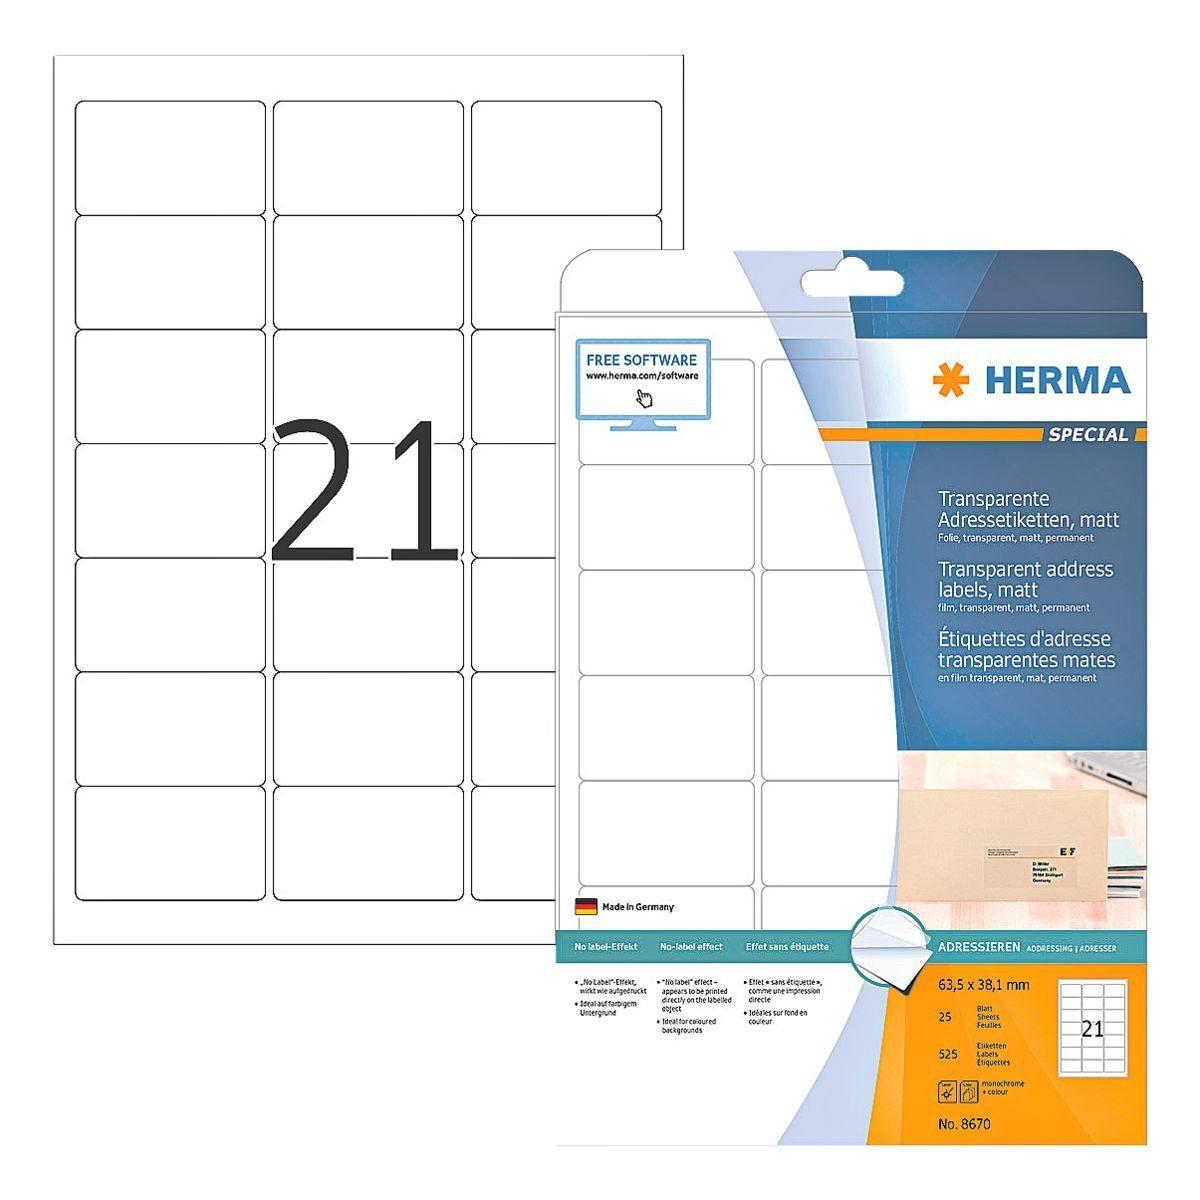 HERMA Transparente Adress-Etiketten 525 Stück »Special«